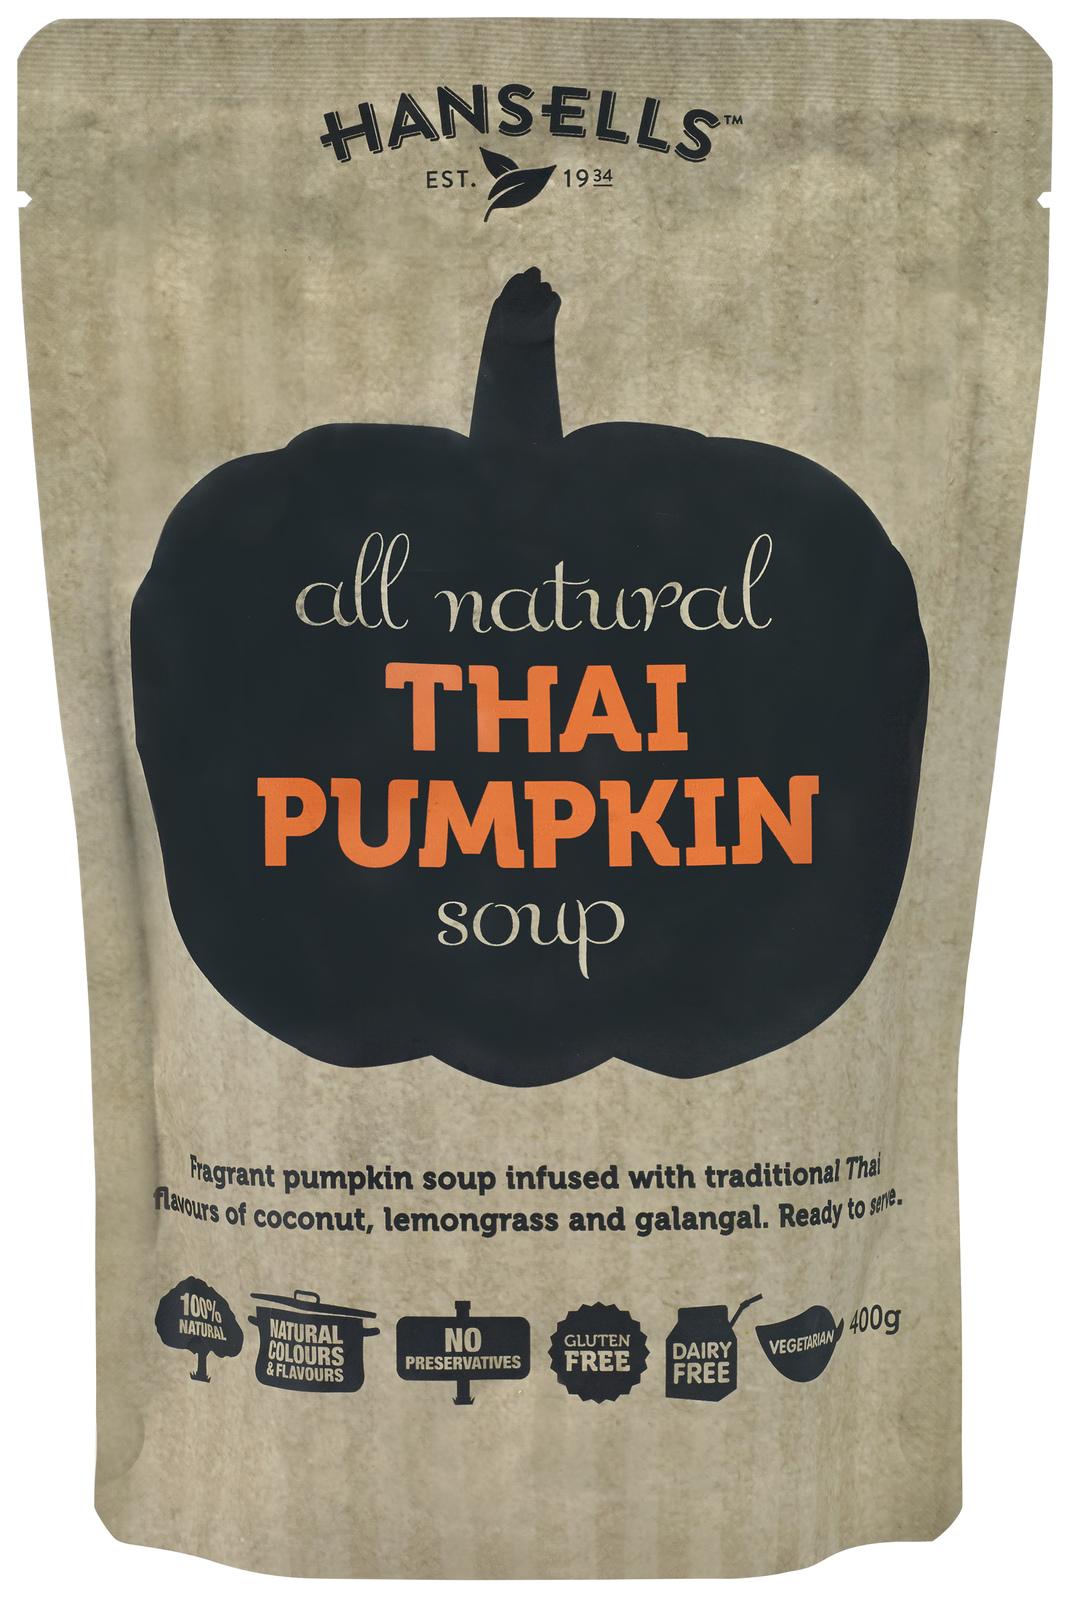 Hansells: All Natural Soup - Thai Pumpkin (6 x 400g) image